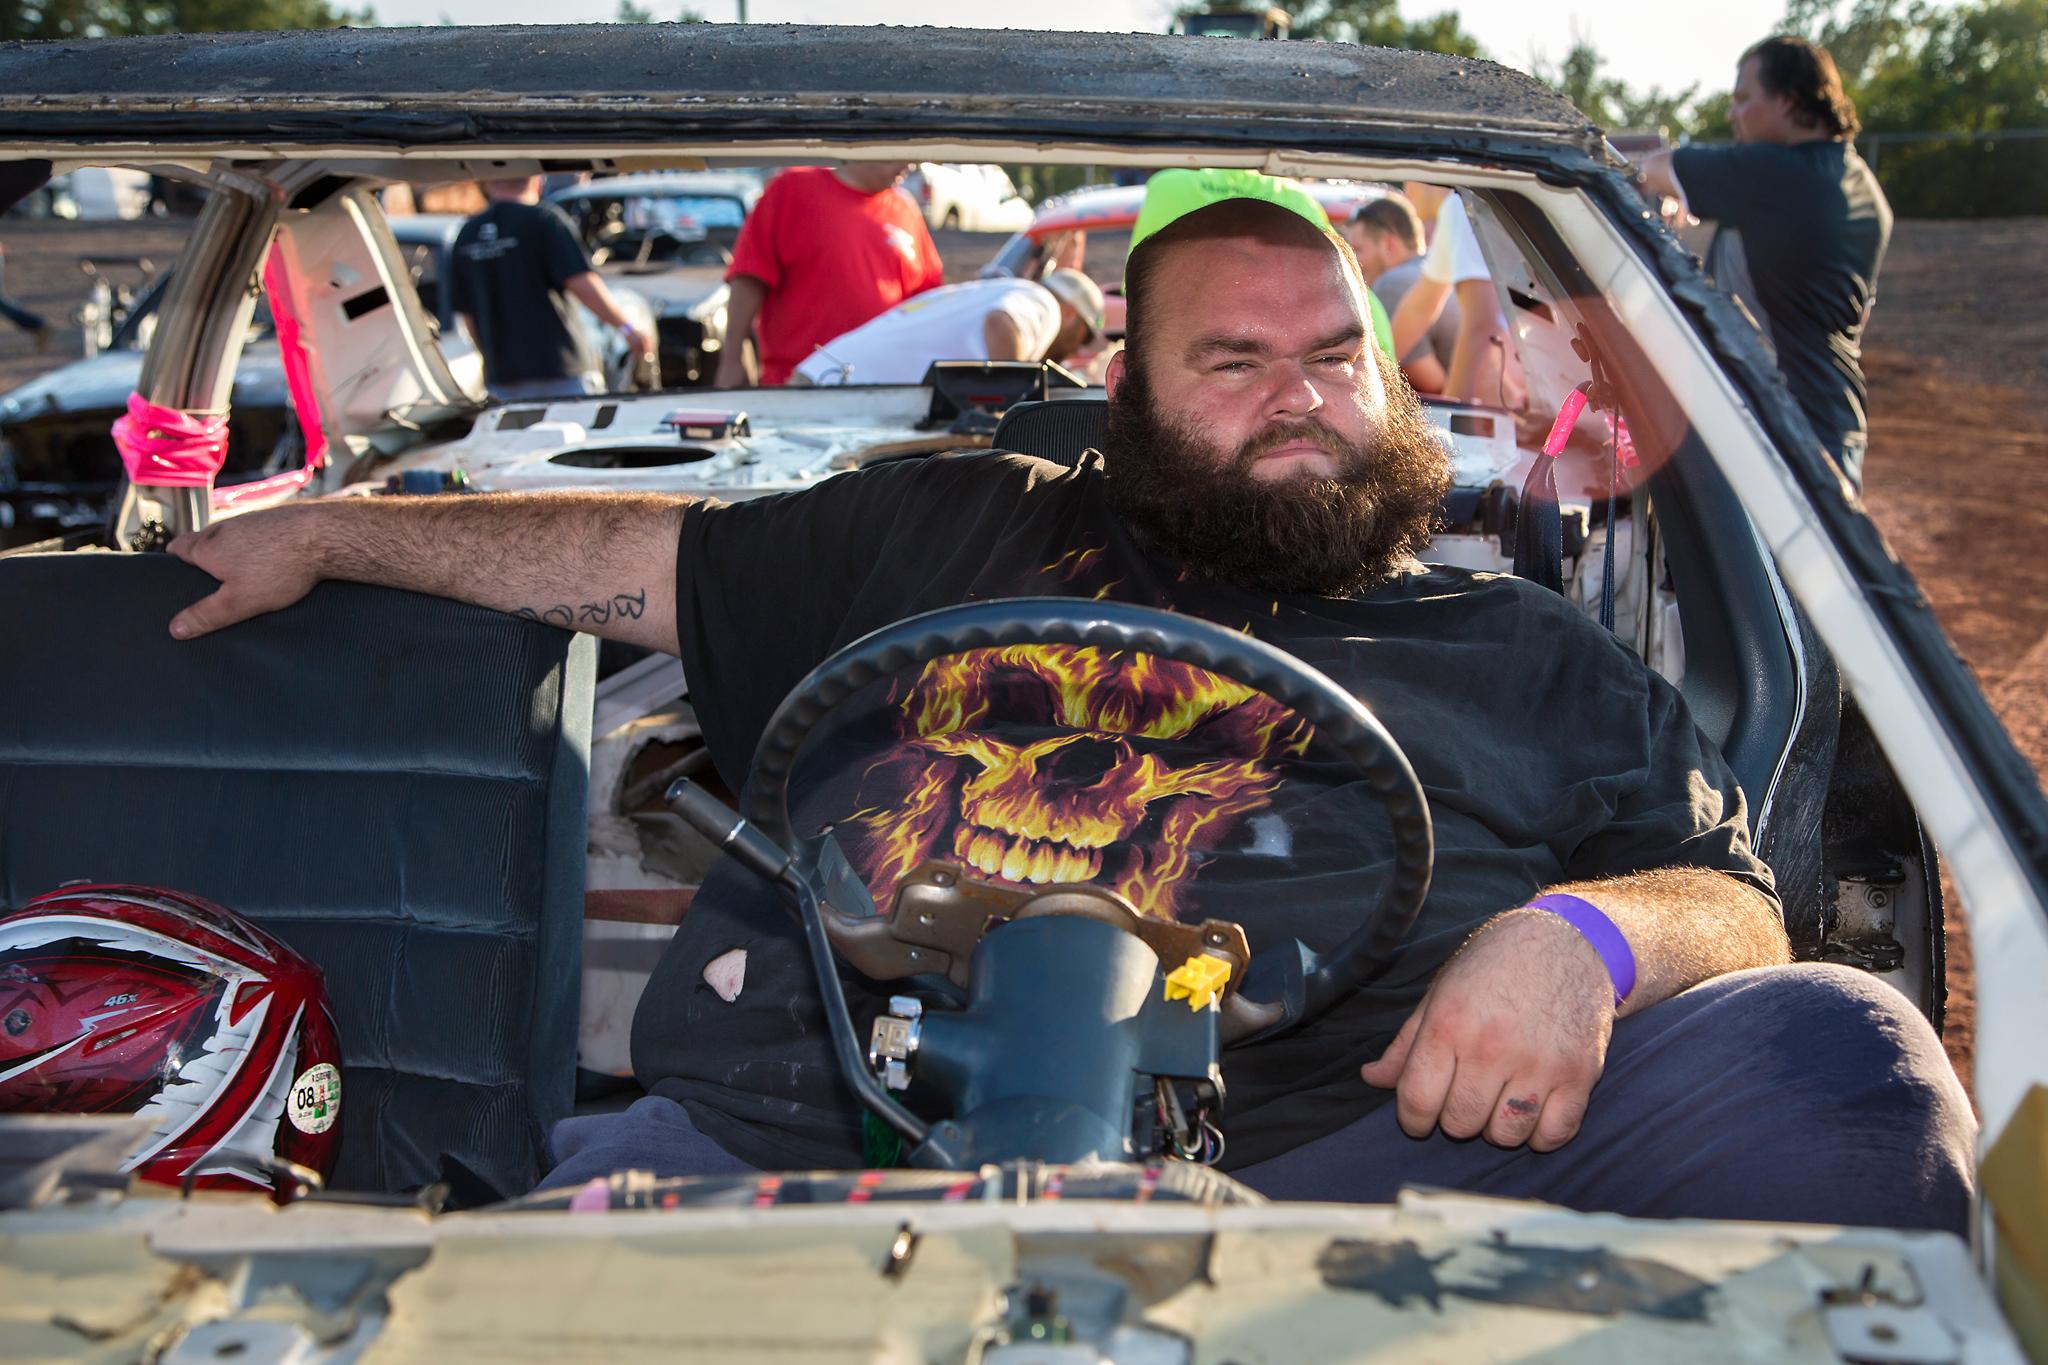 James, Demolition Derby Driver - Manassas, VA, 2015